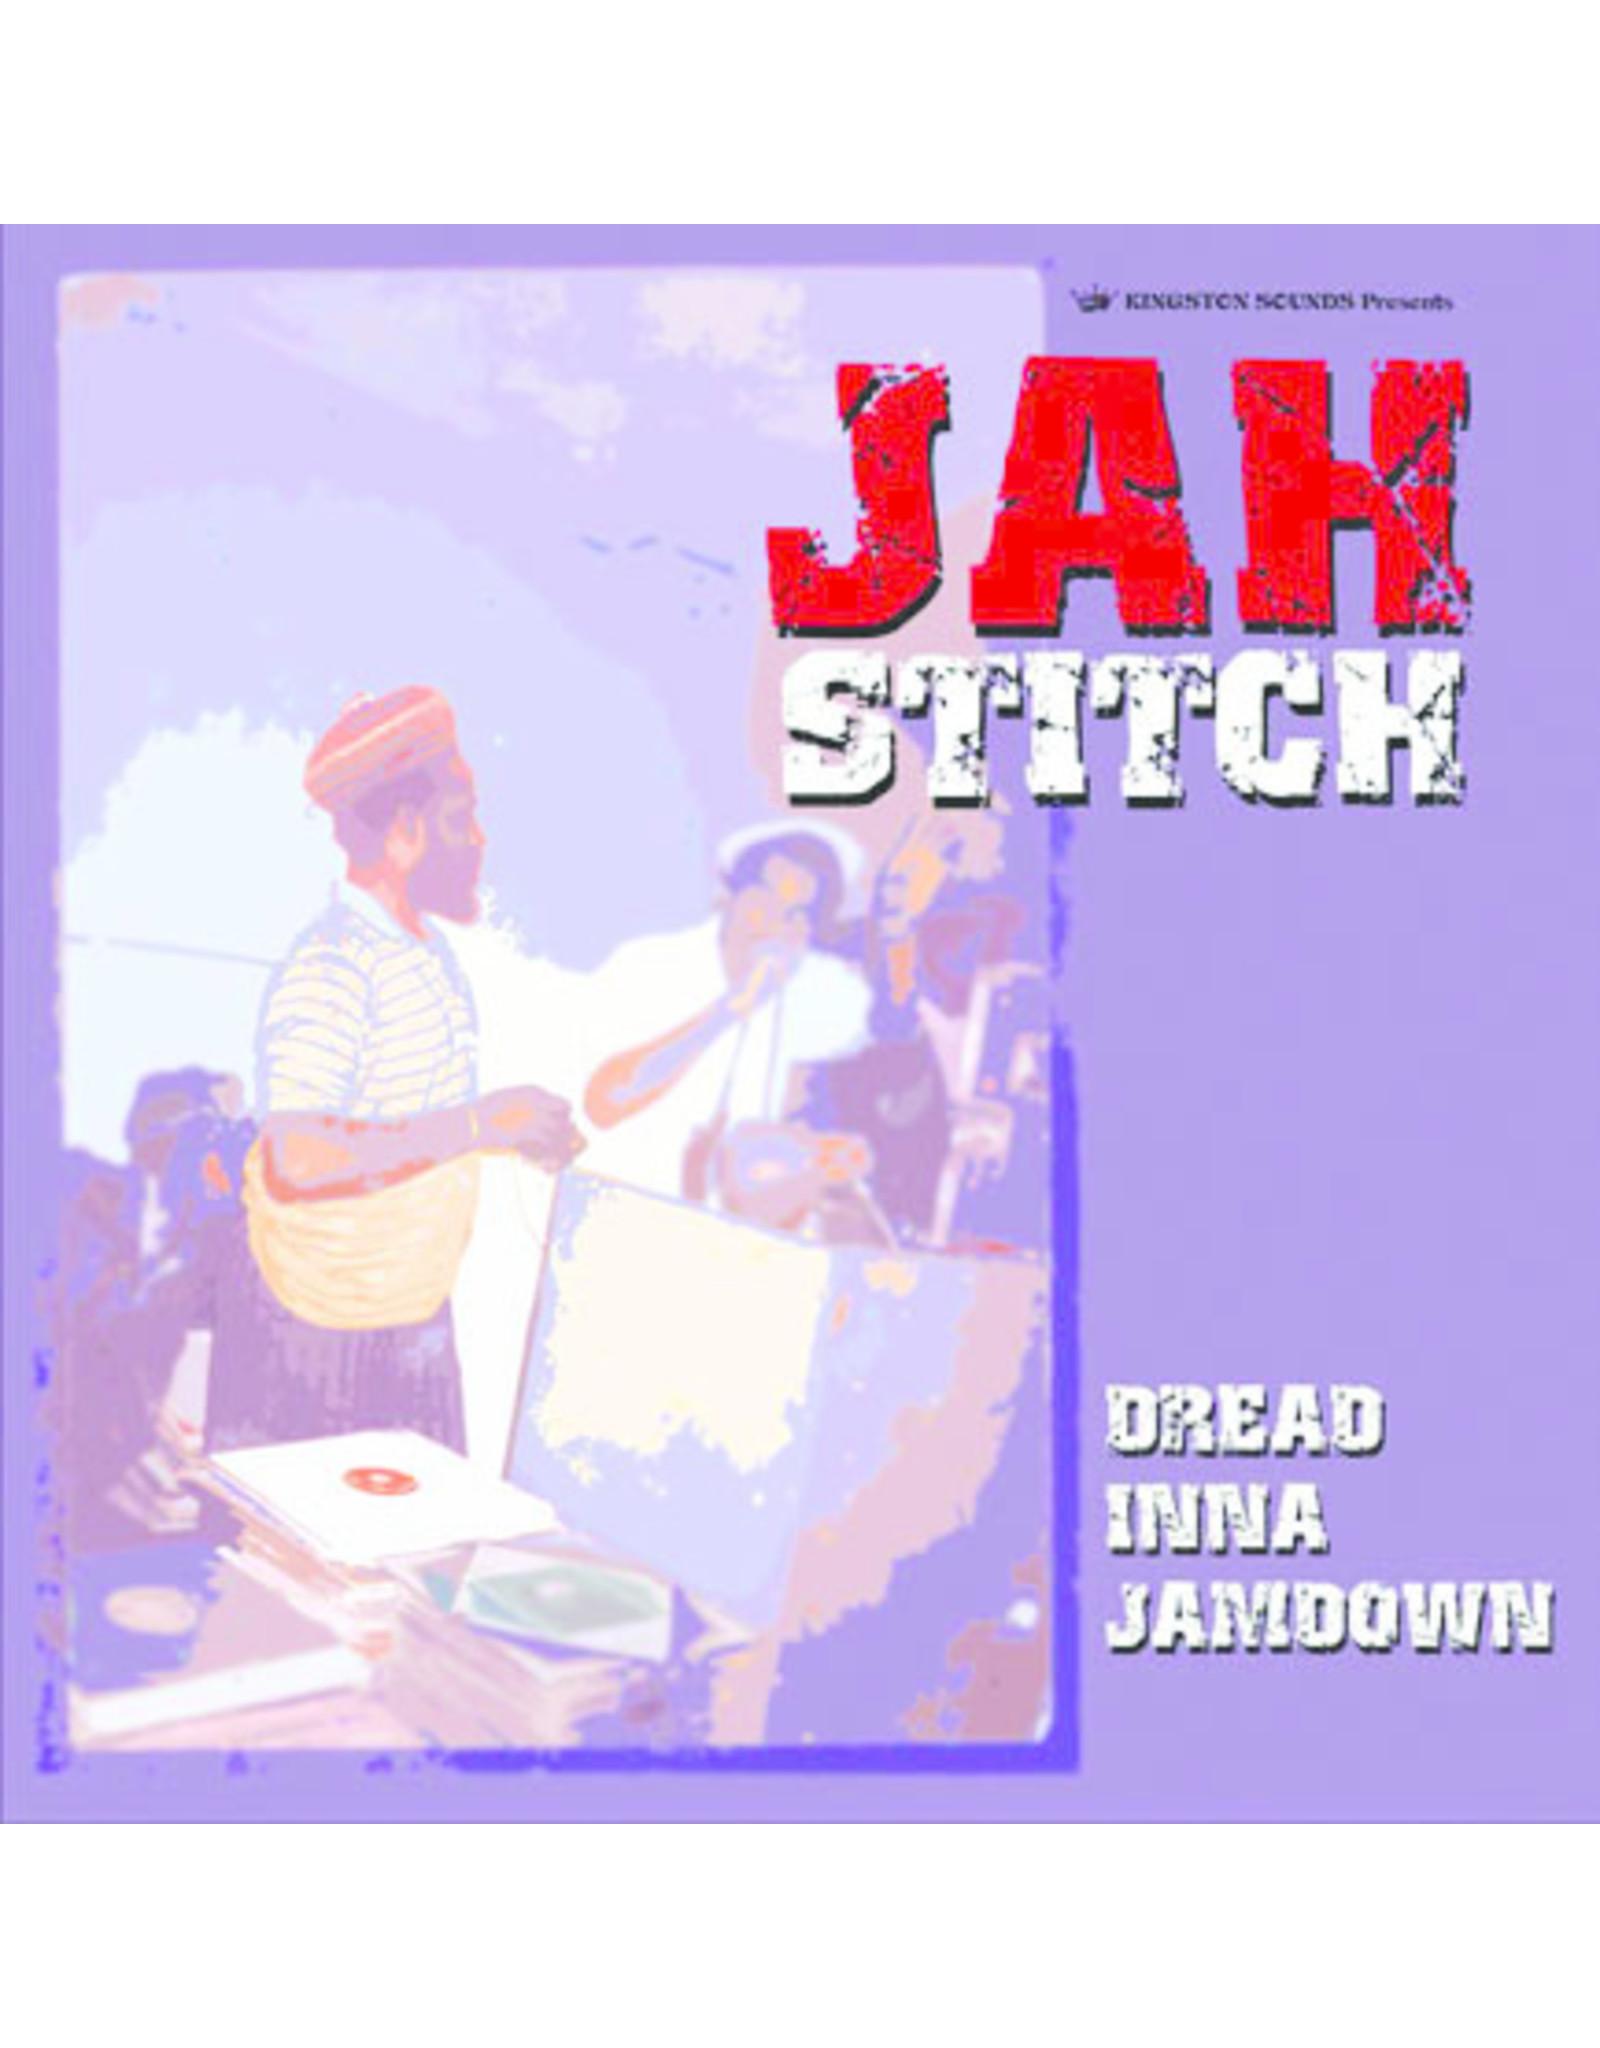 New Vinyl Jah Stitch - Dread Inna Jamtown LP